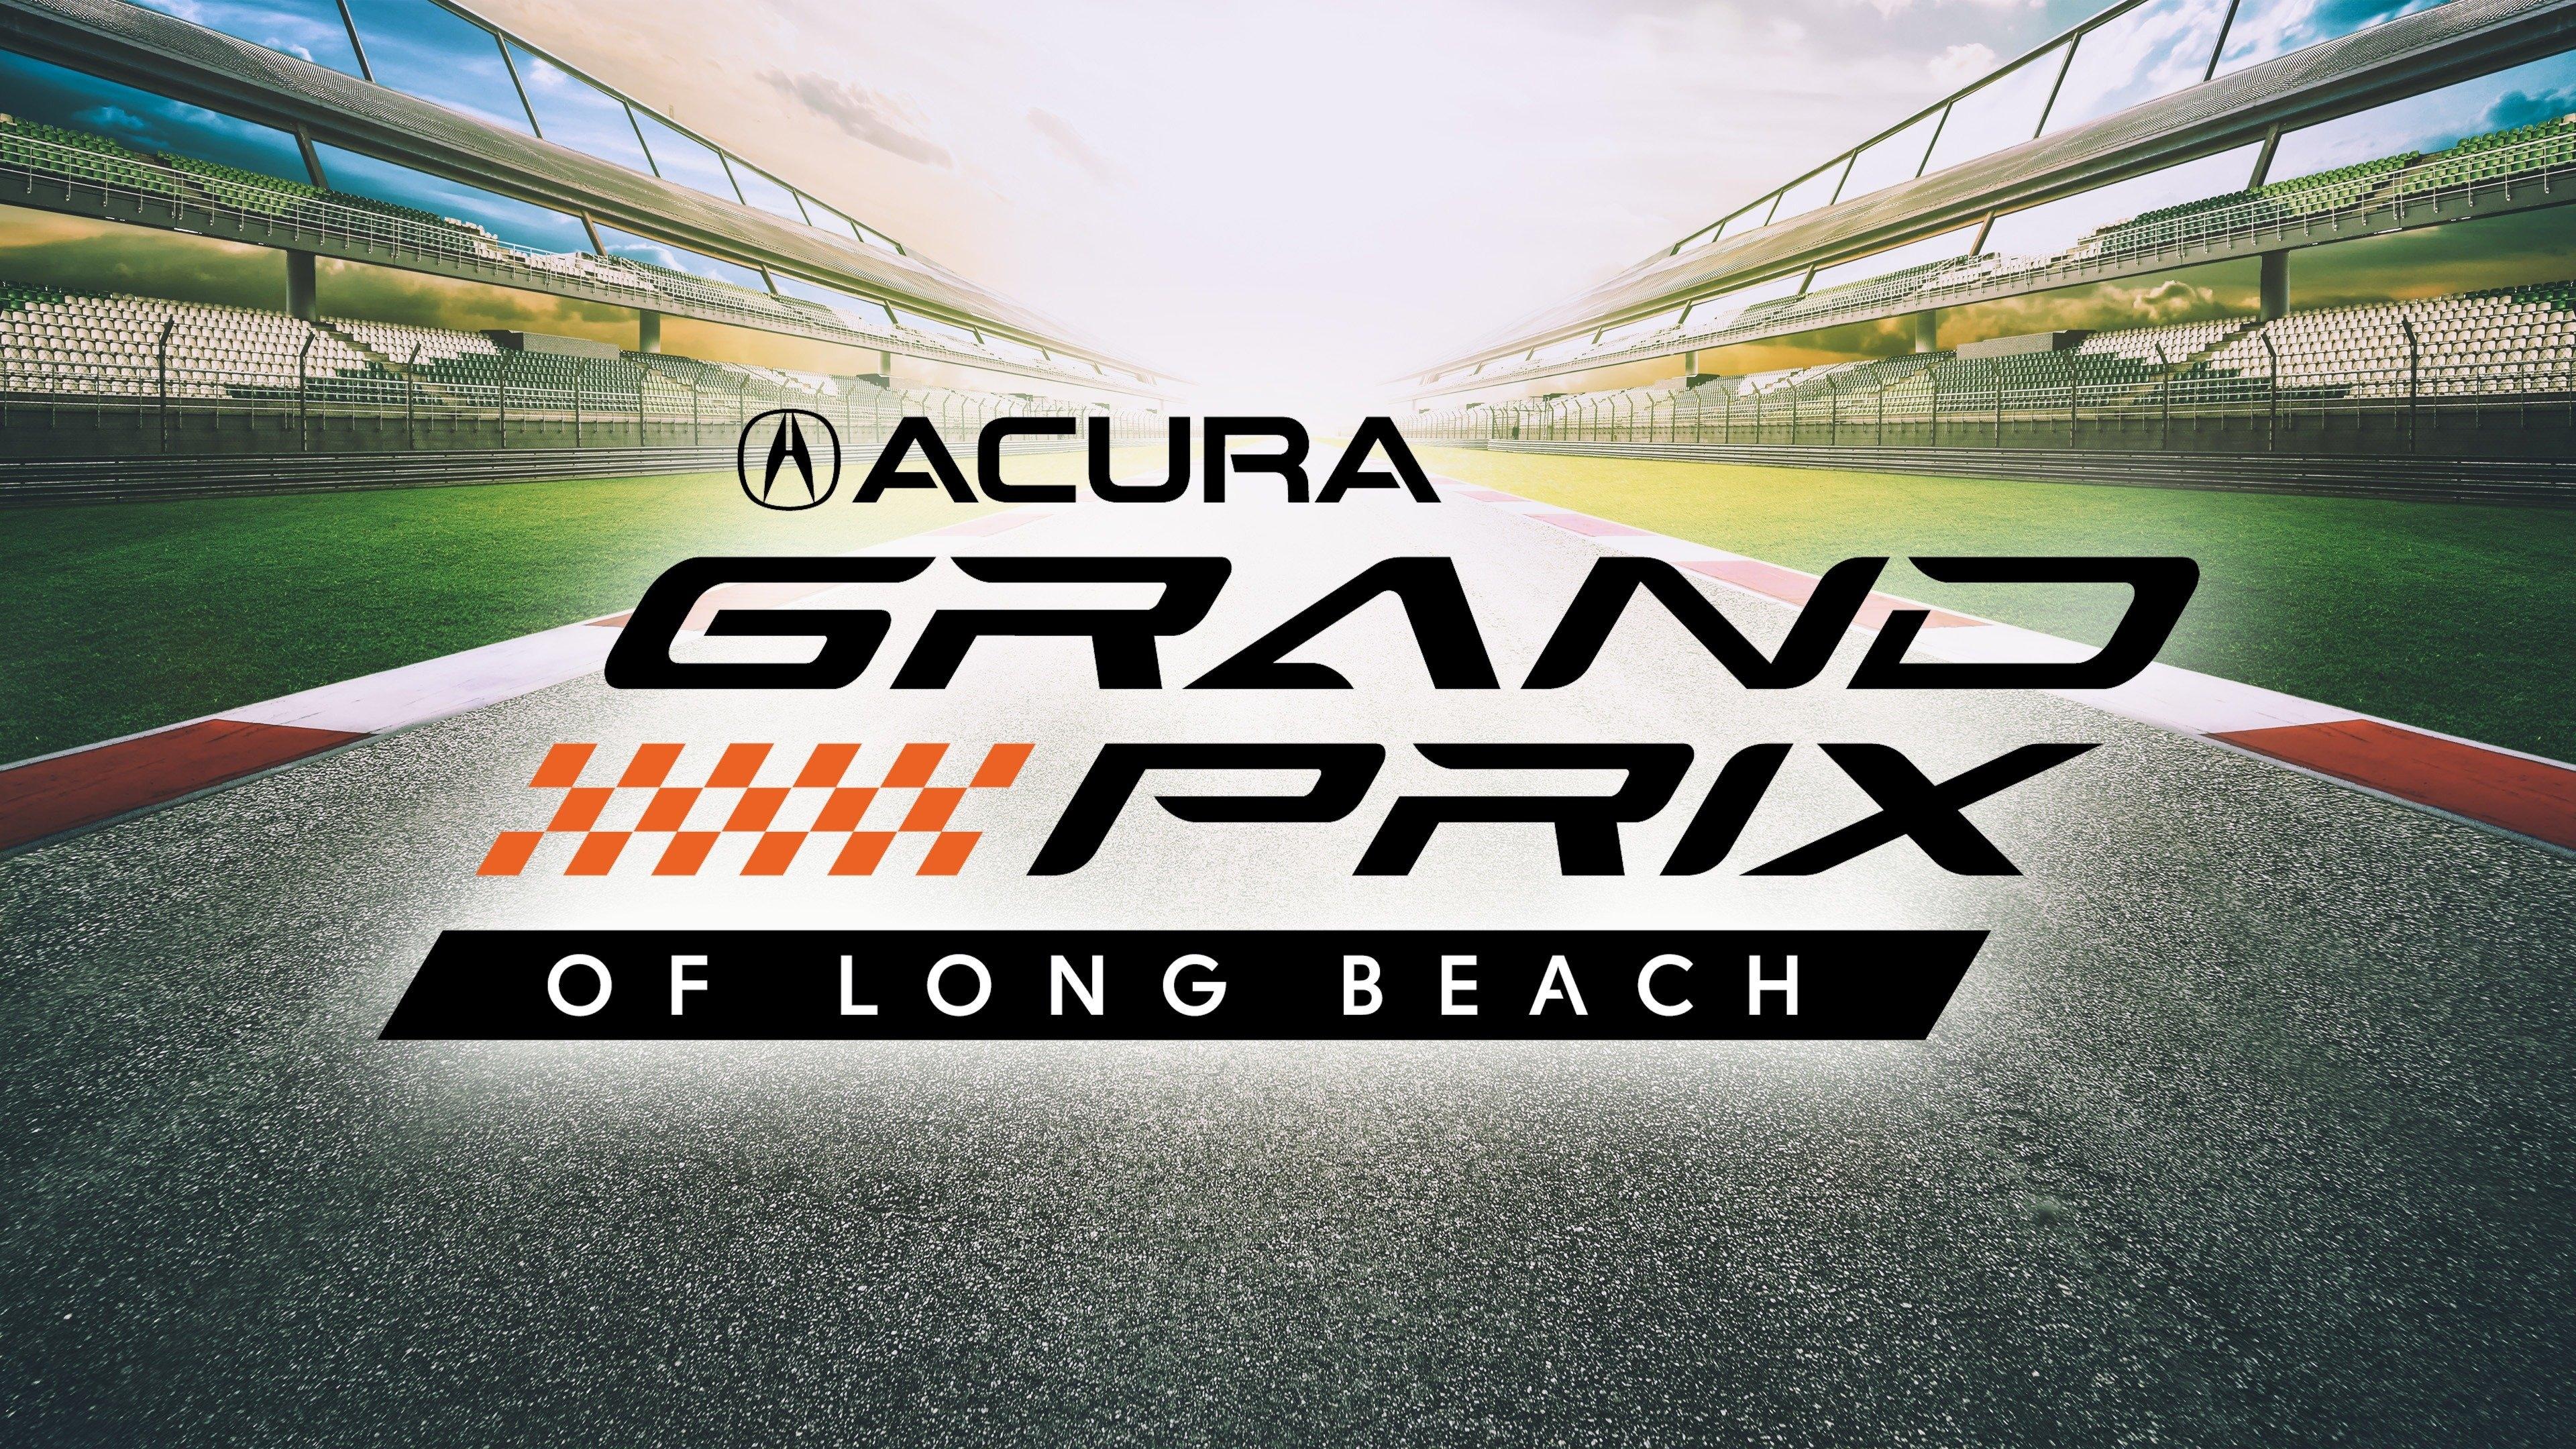 Acura Grand Prix of Long Beach